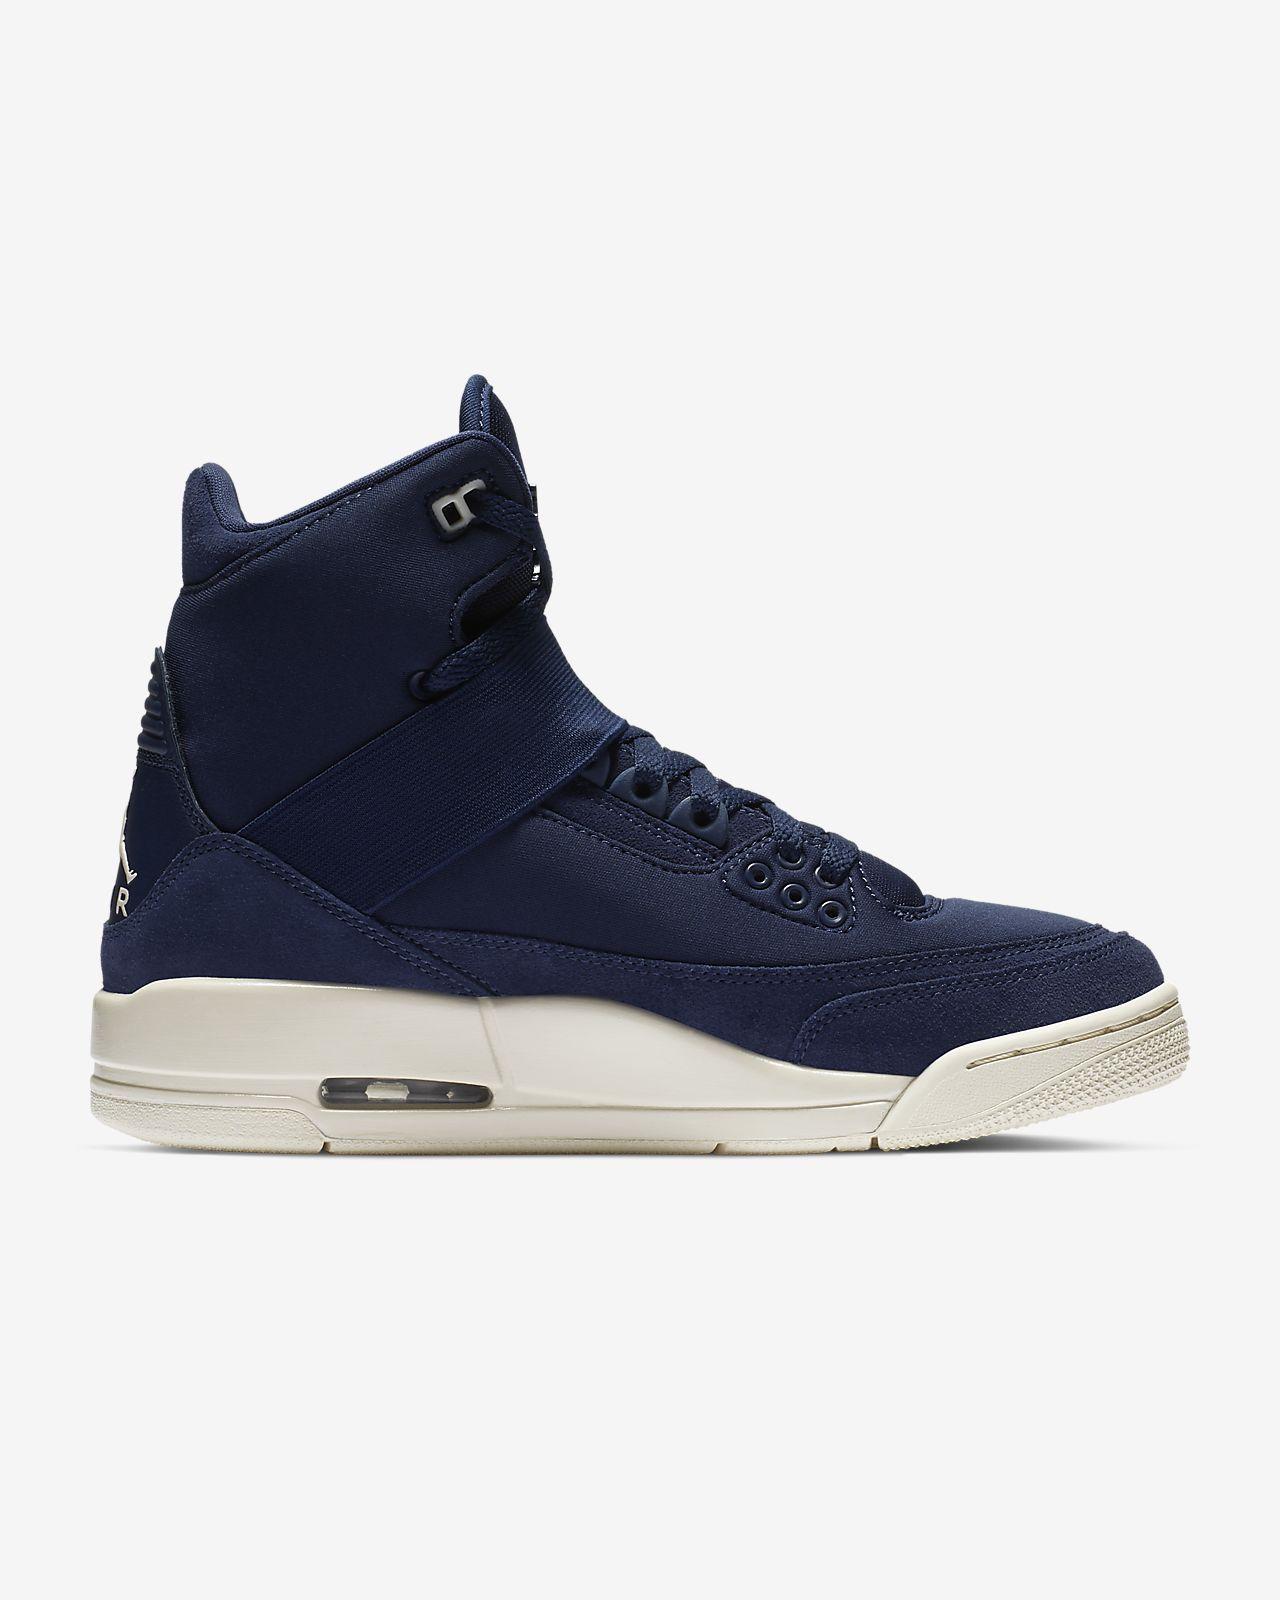 447279c617d9f4 Air Jordan 3 Retro Explorer XX Women s Shoe. Nike.com CA